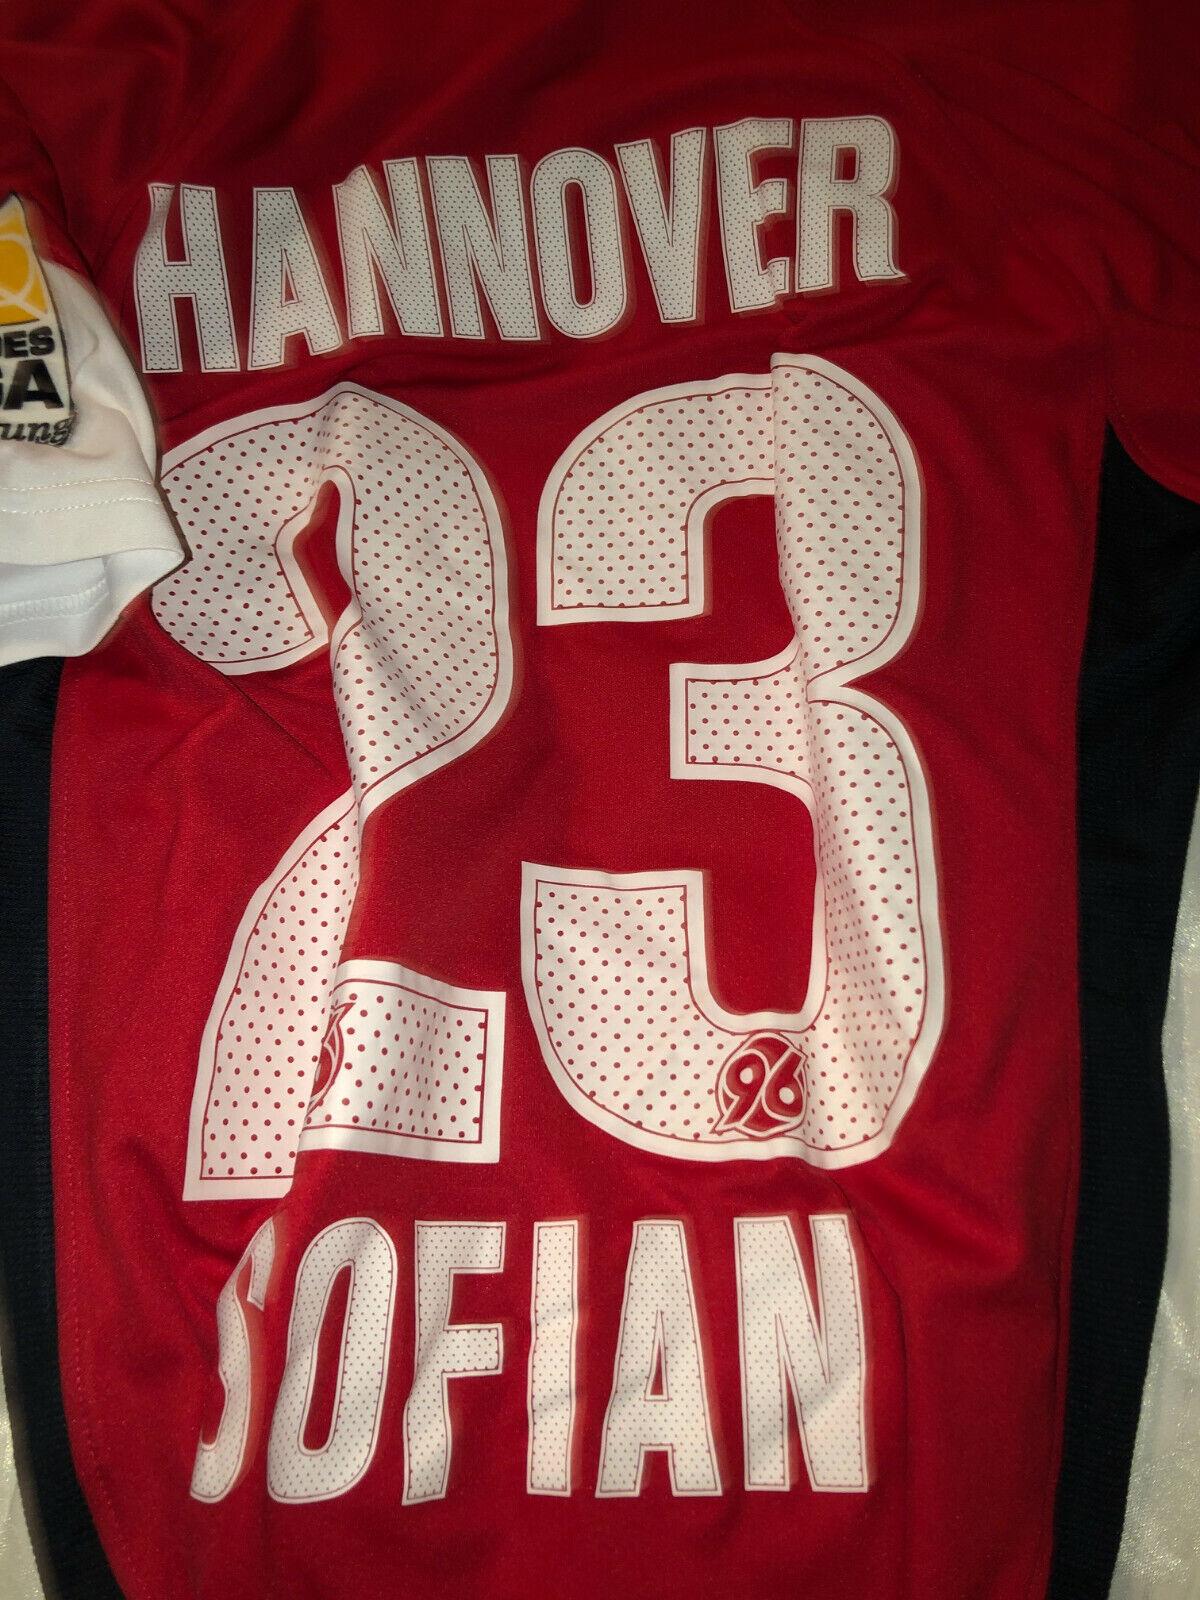 Maglia match worn preparata Hannover Sofian shirt originale Bundesliga Germania